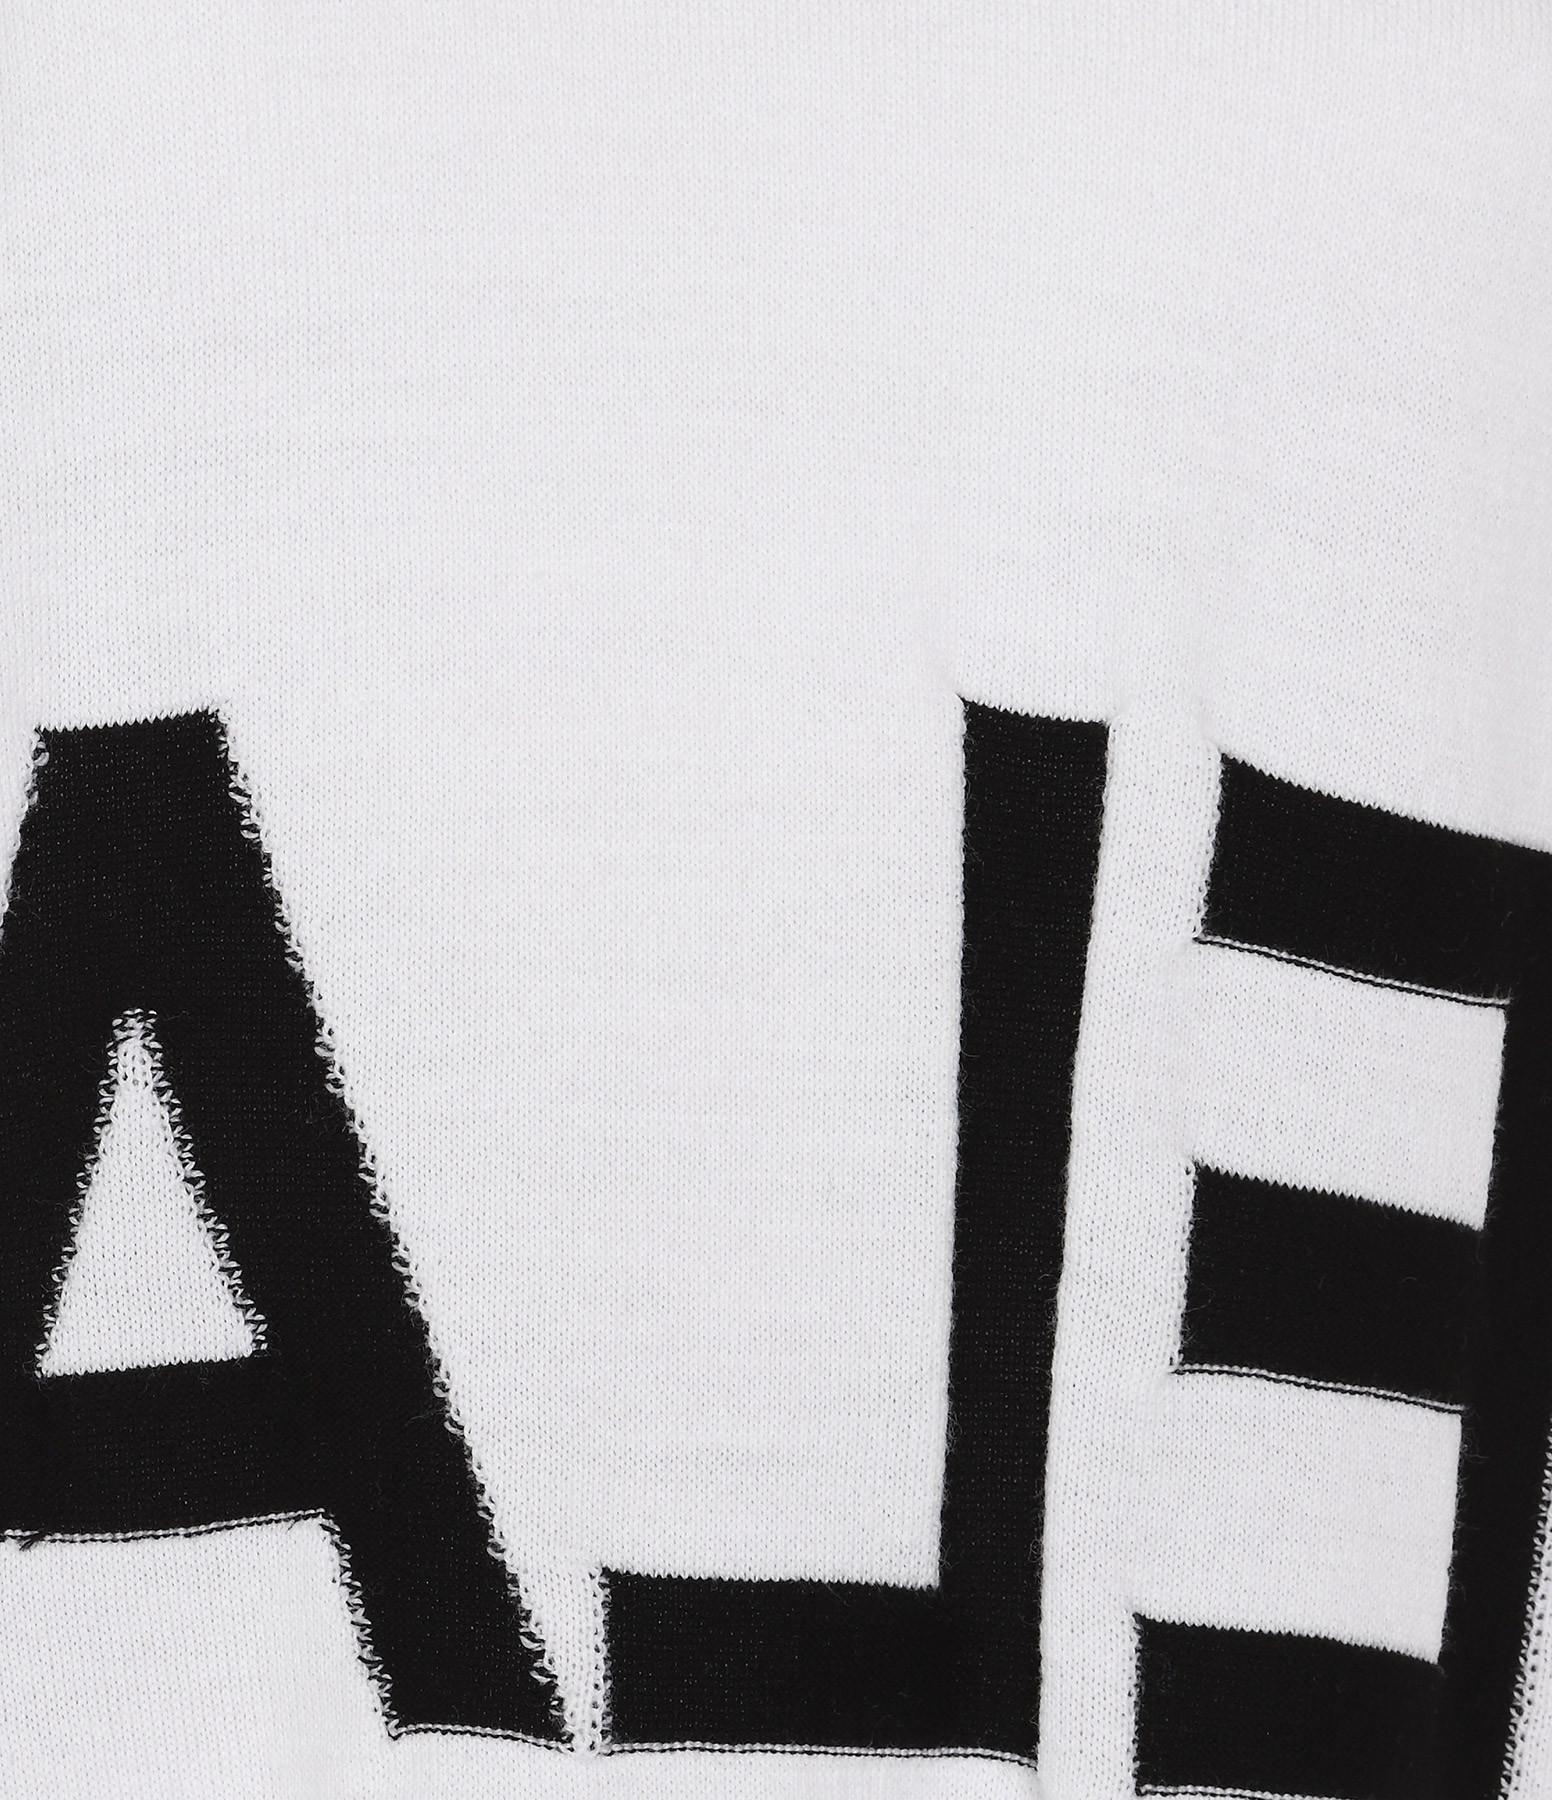 MM6 MAISON MARGIELA - Pull Gauge 14 Noir Blanc